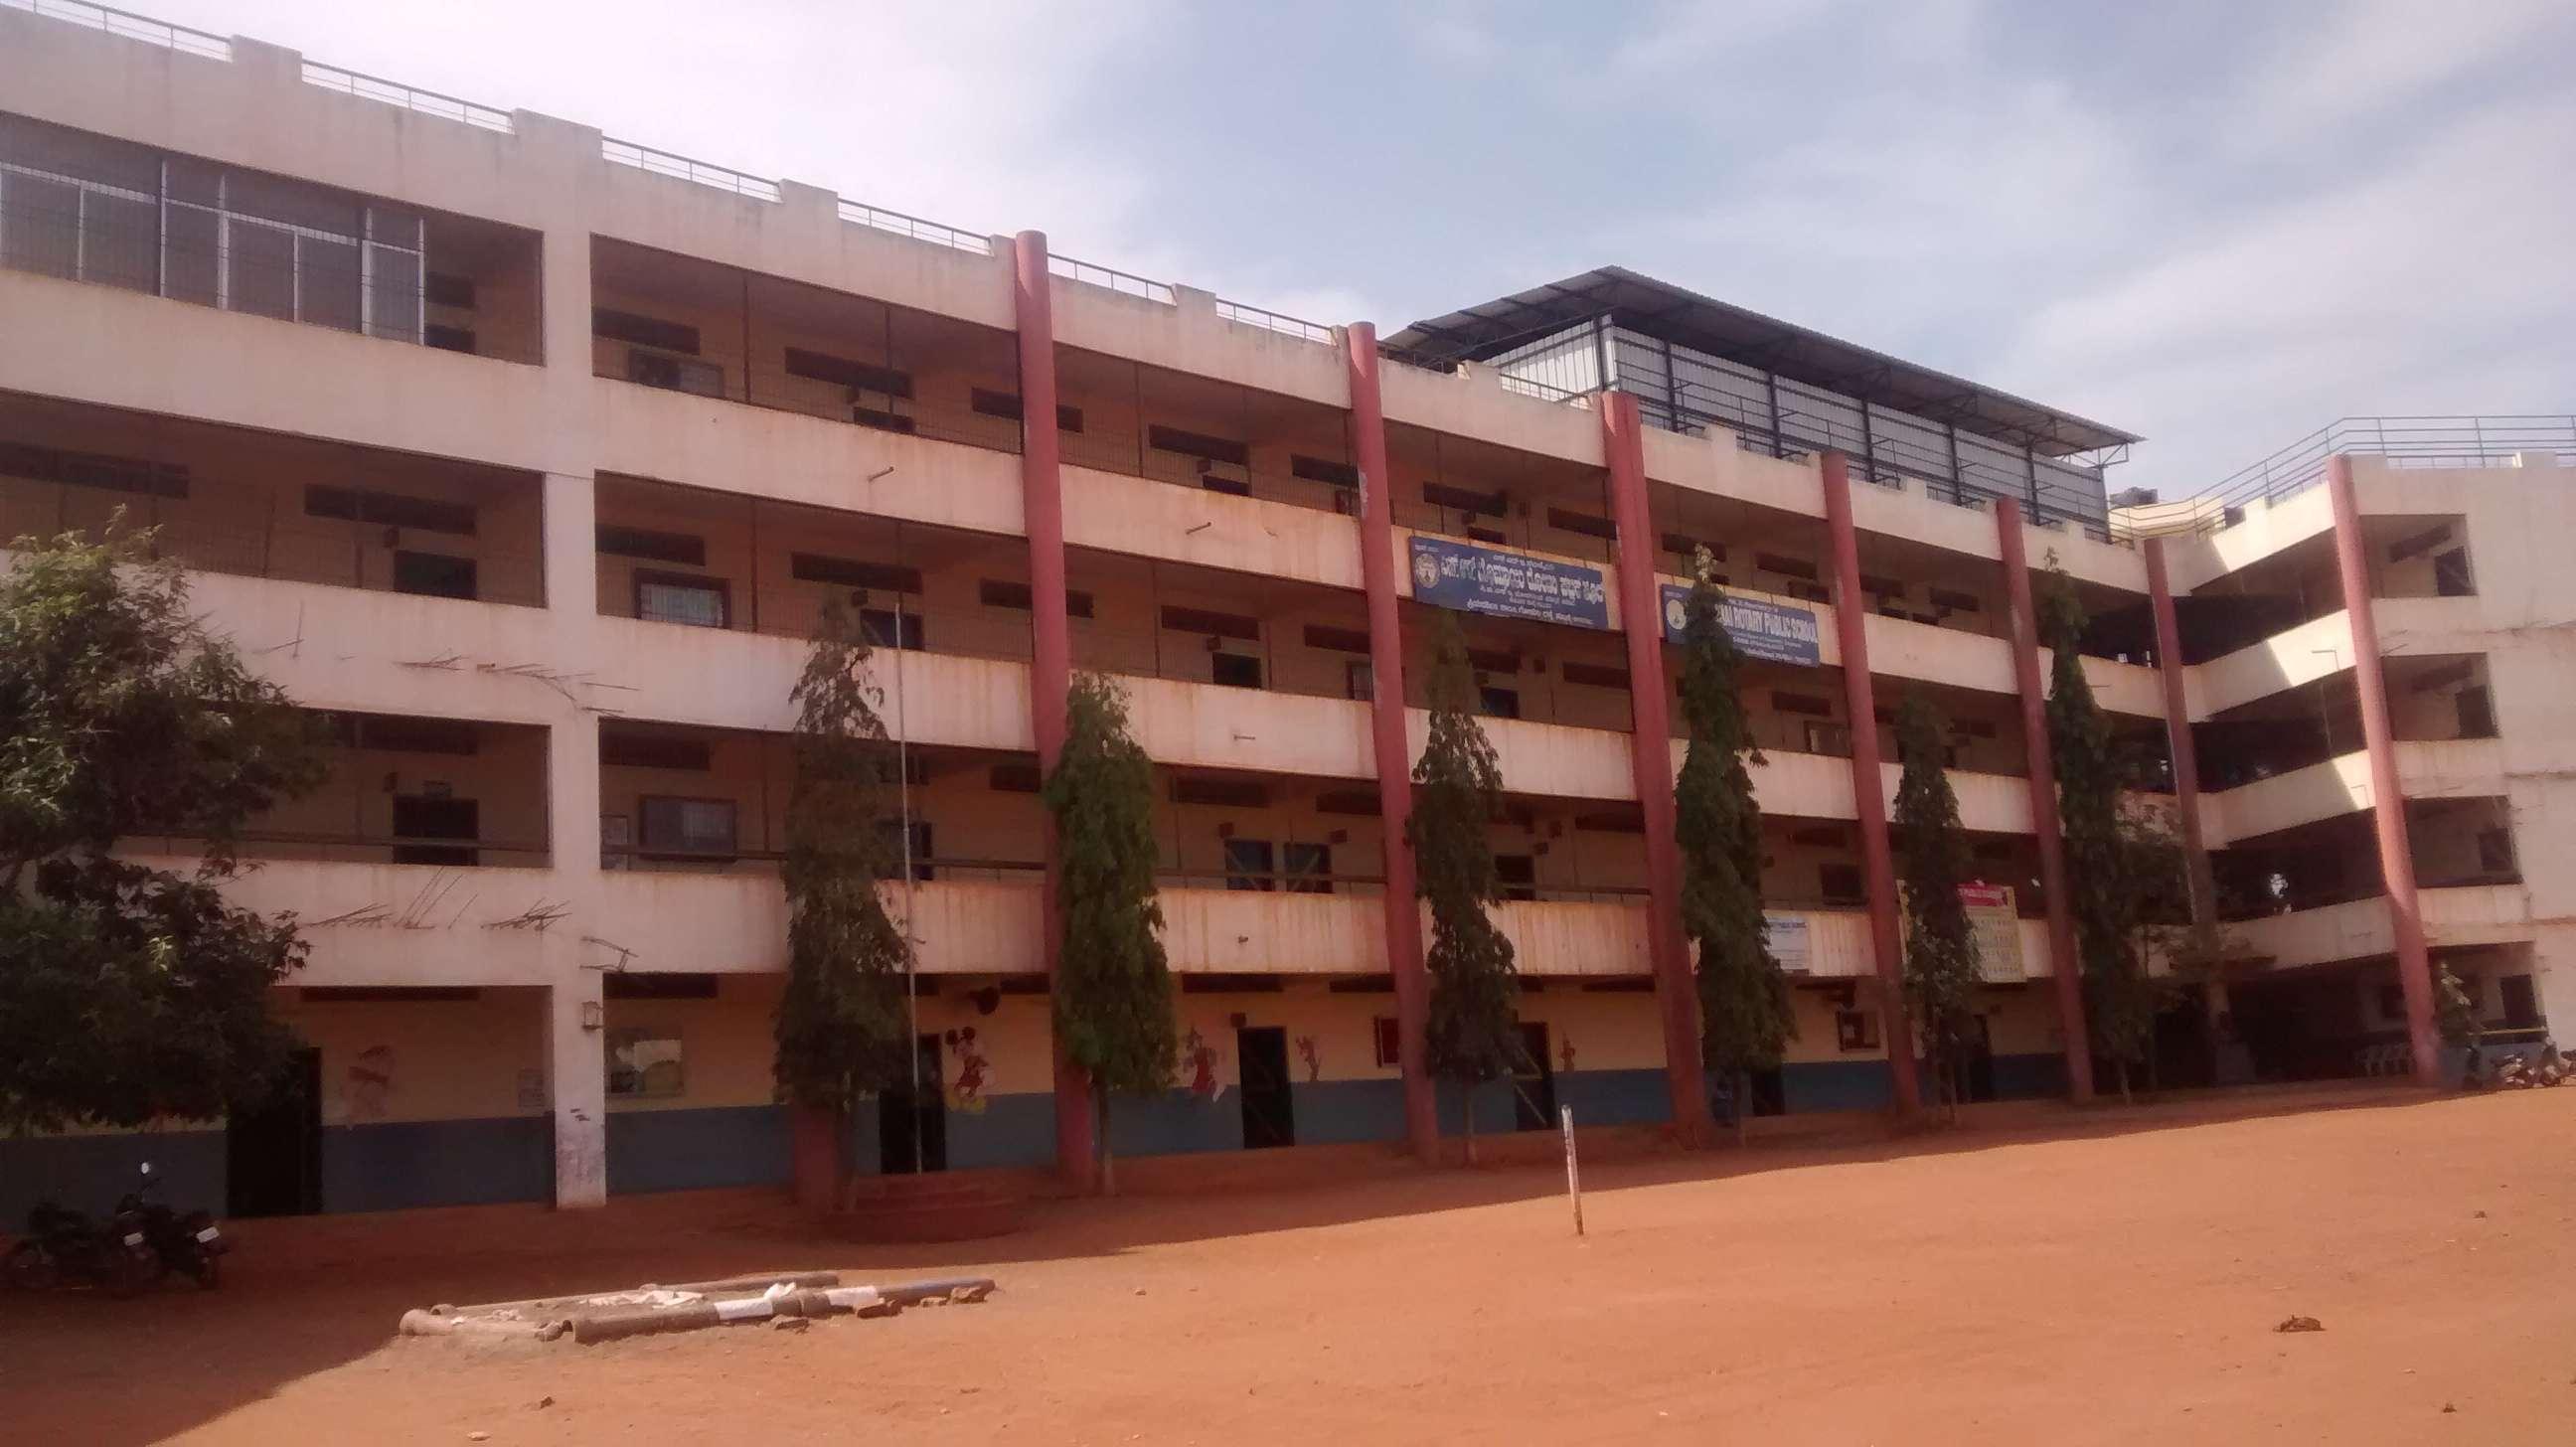 rotary school priyadarshini colony Gokul Road Hubli DISTT DHARWAD 830279